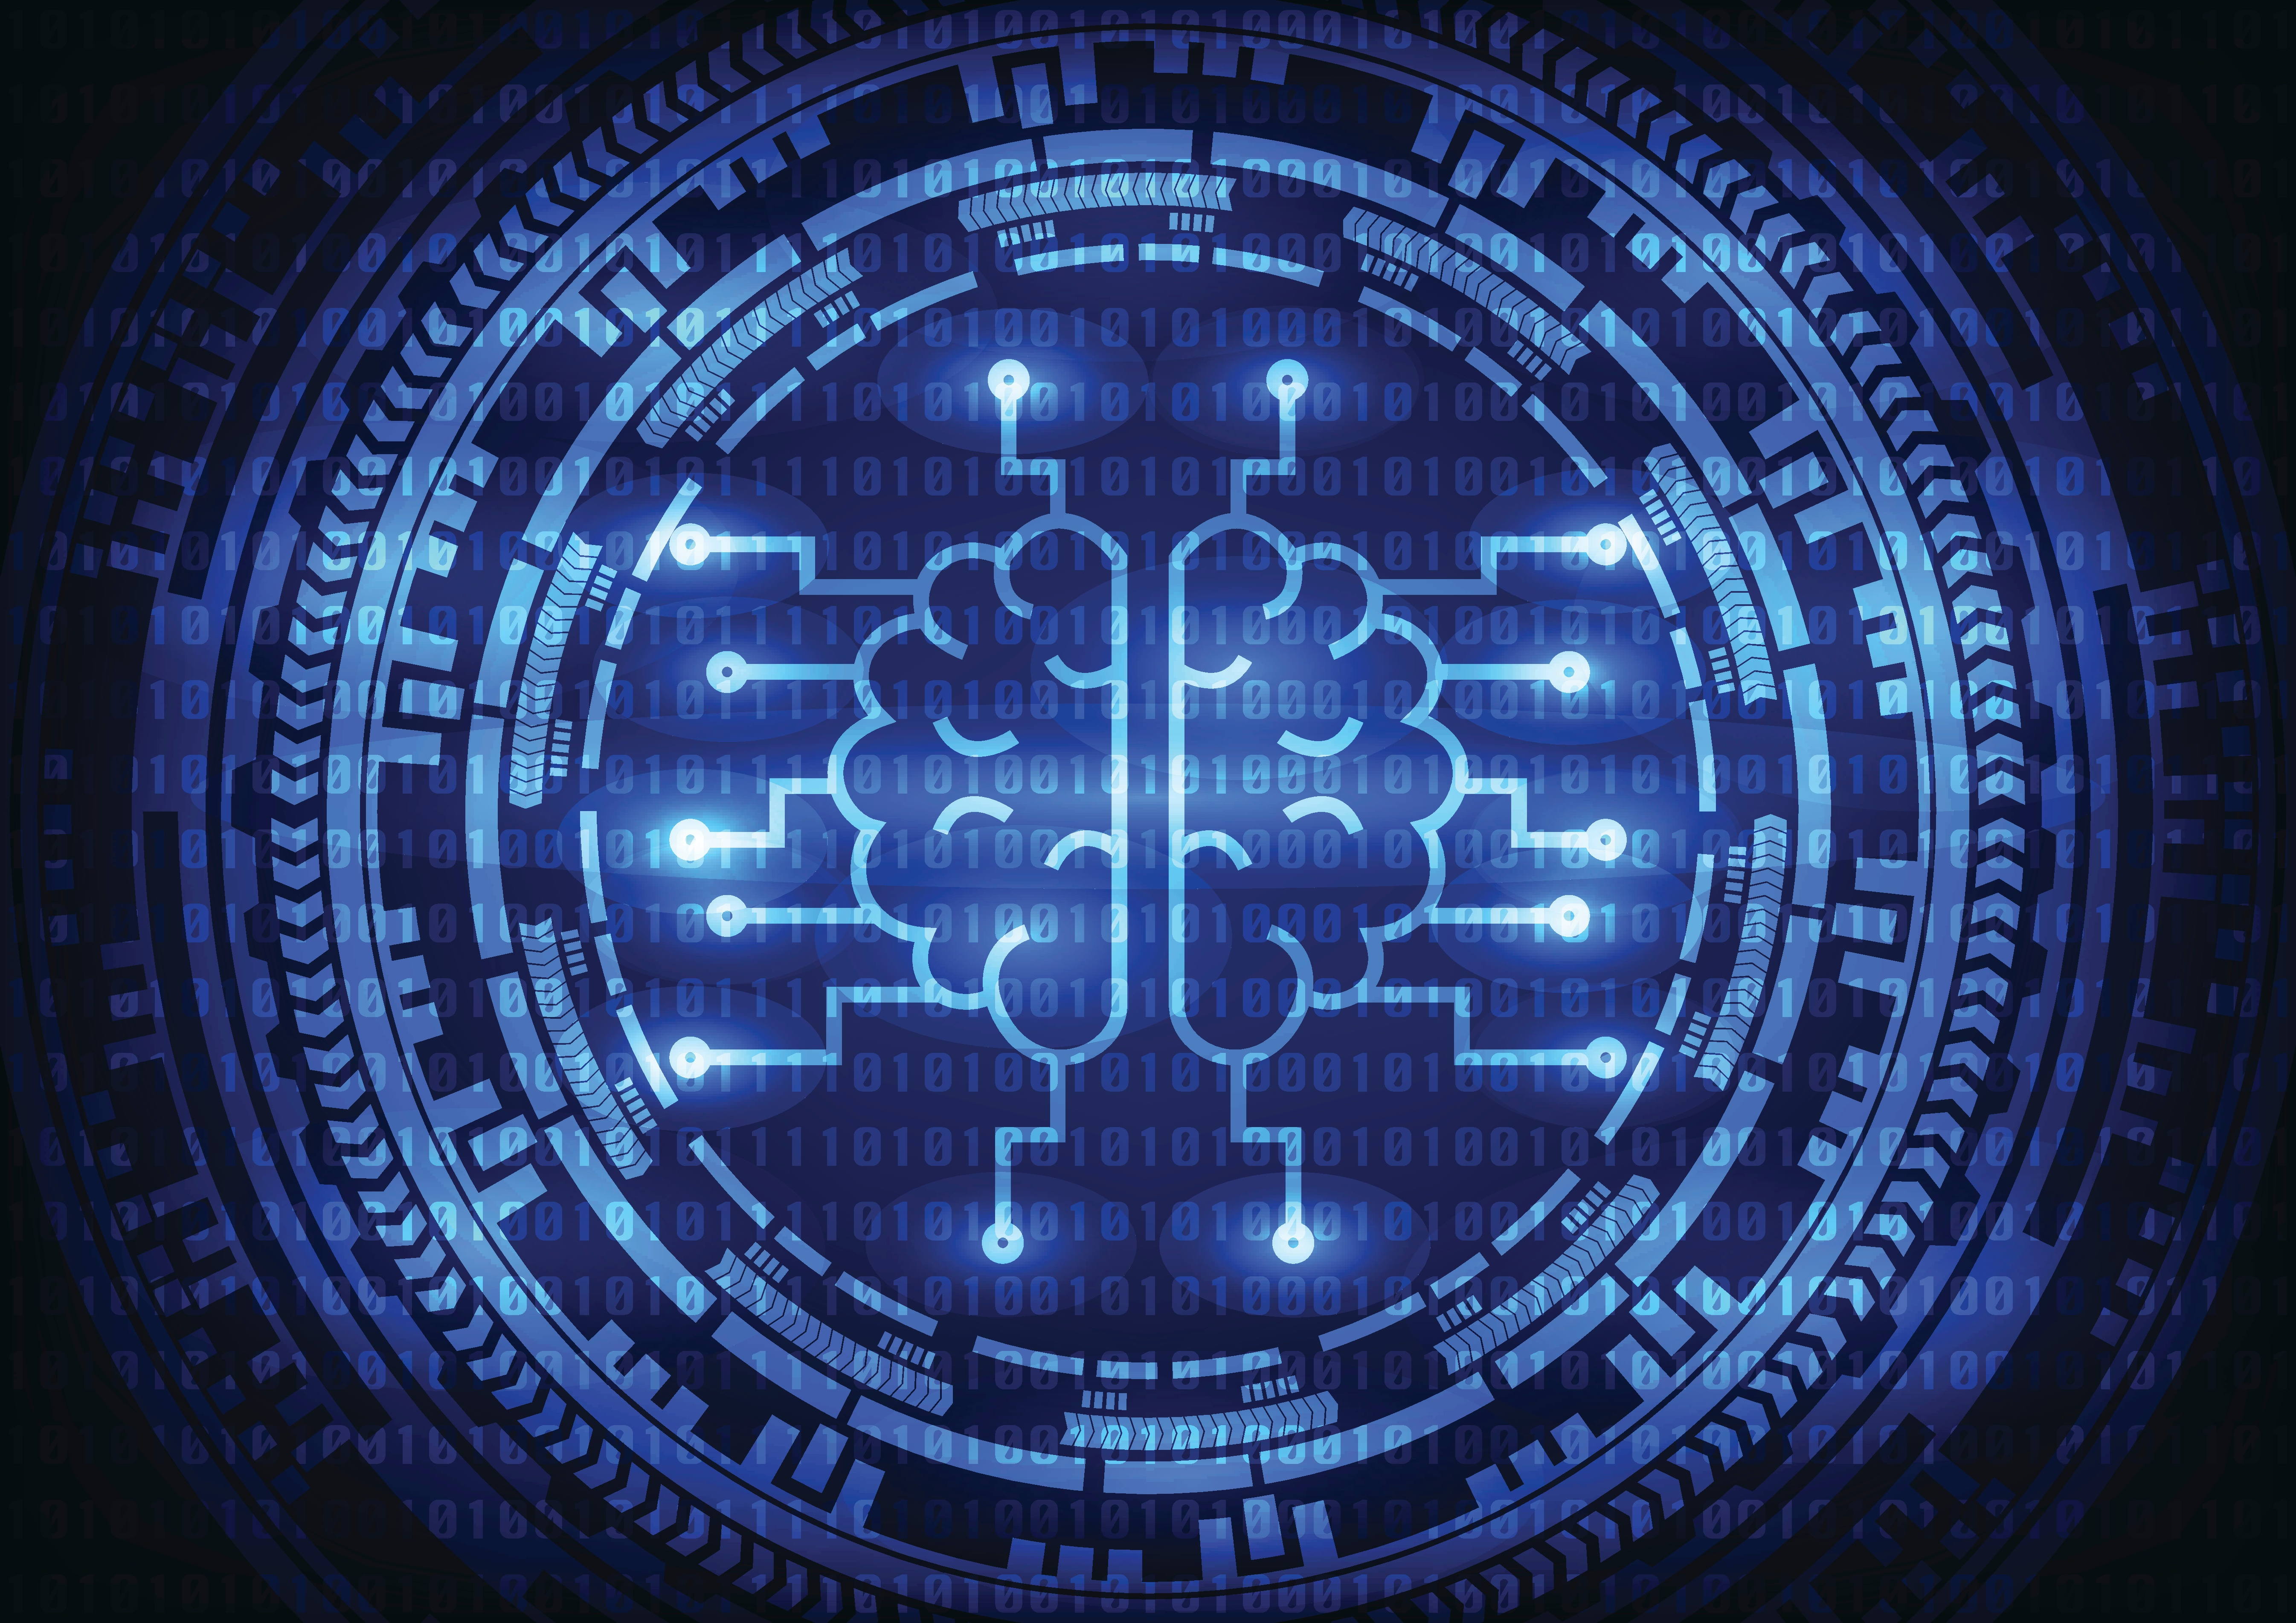 Cognitive Computing trap